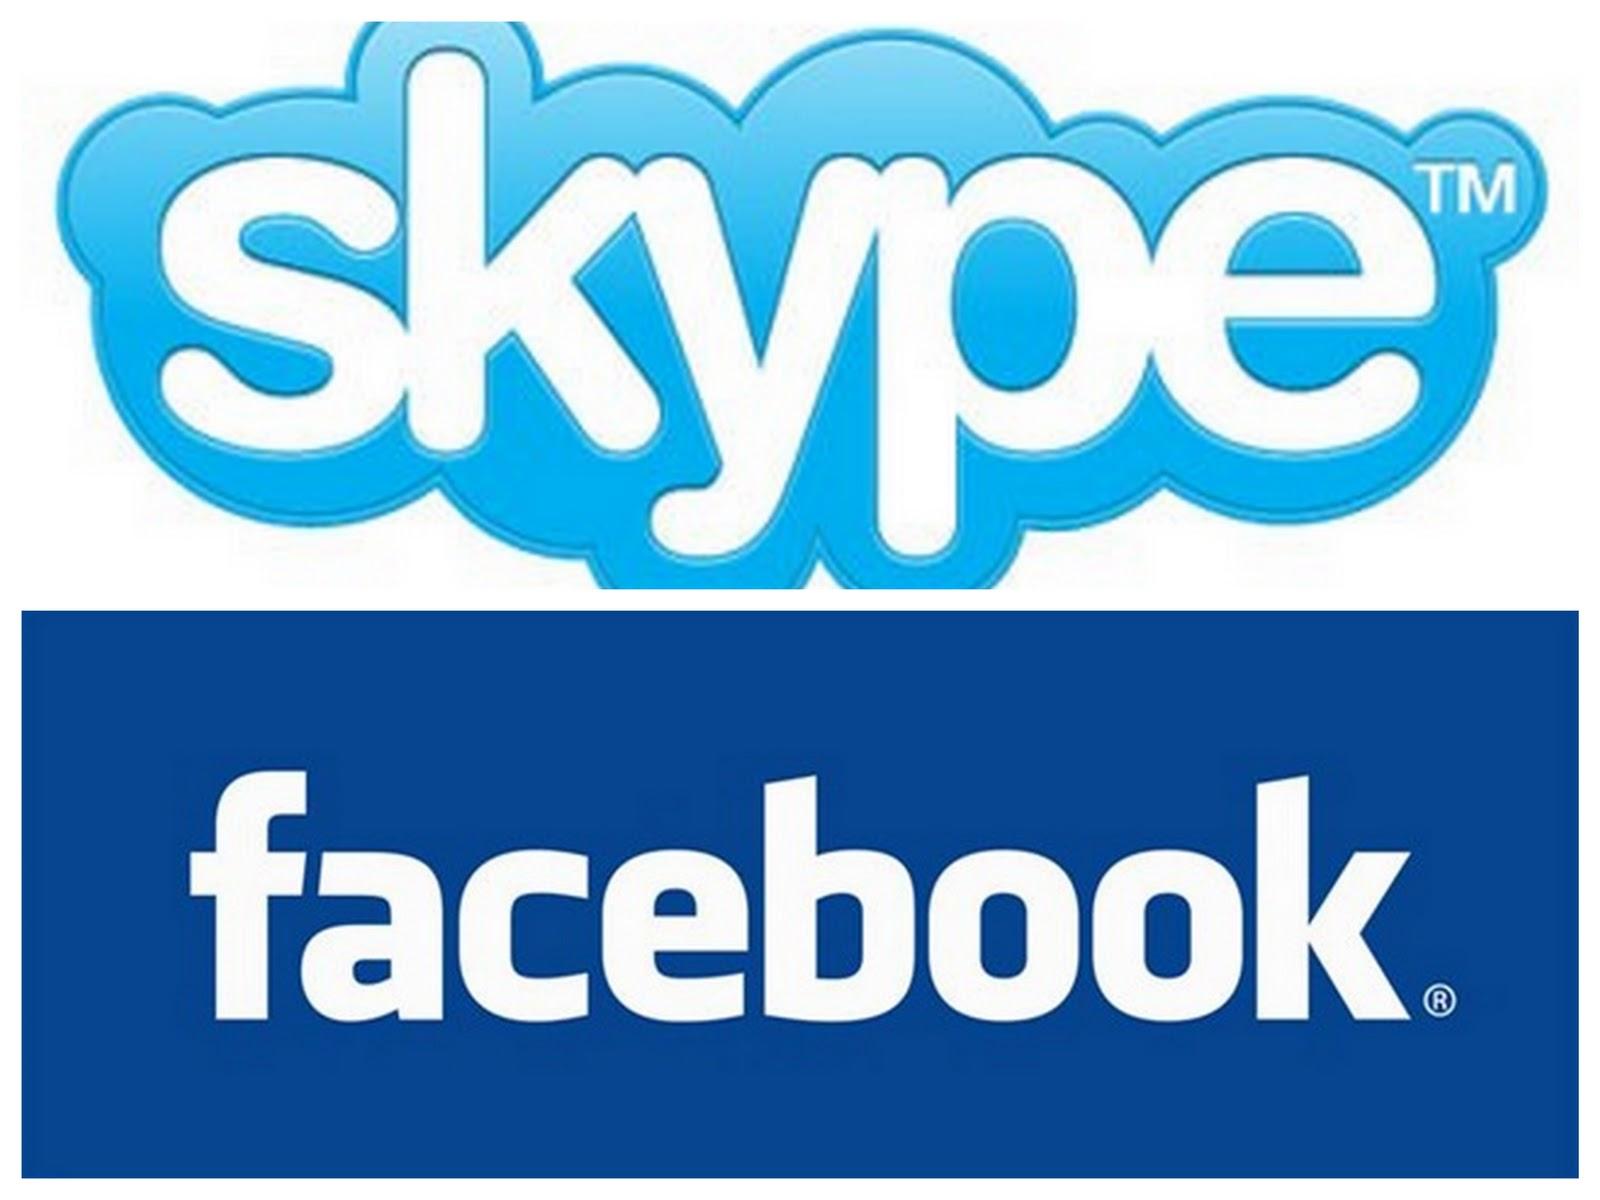 Skype+Facebook